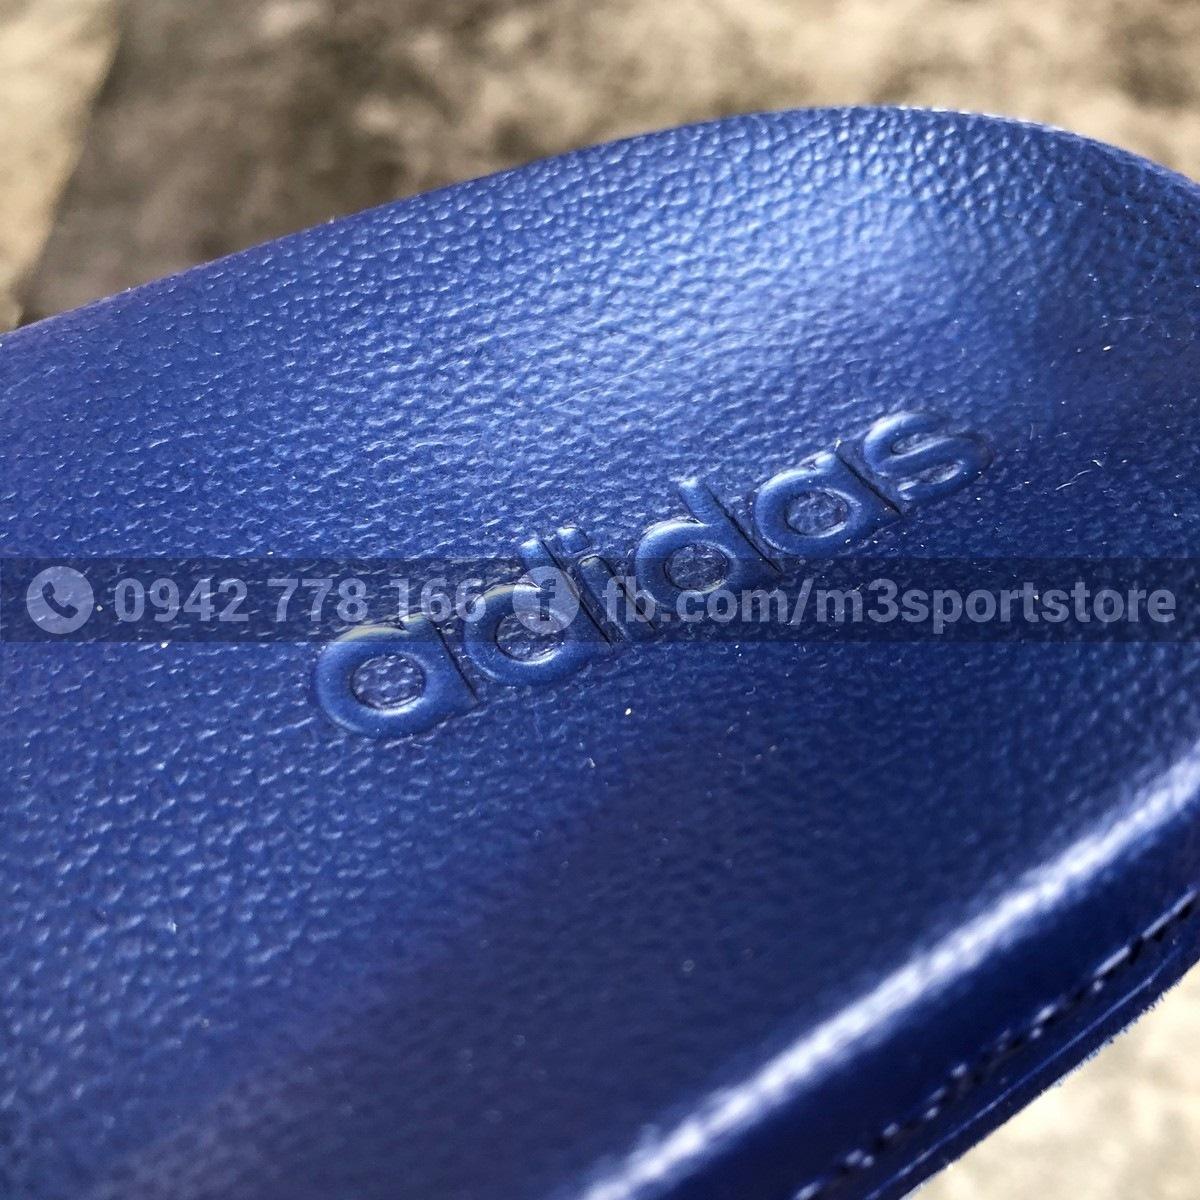 Dép thể thao nam Adidas  Adilette Shower FW7073